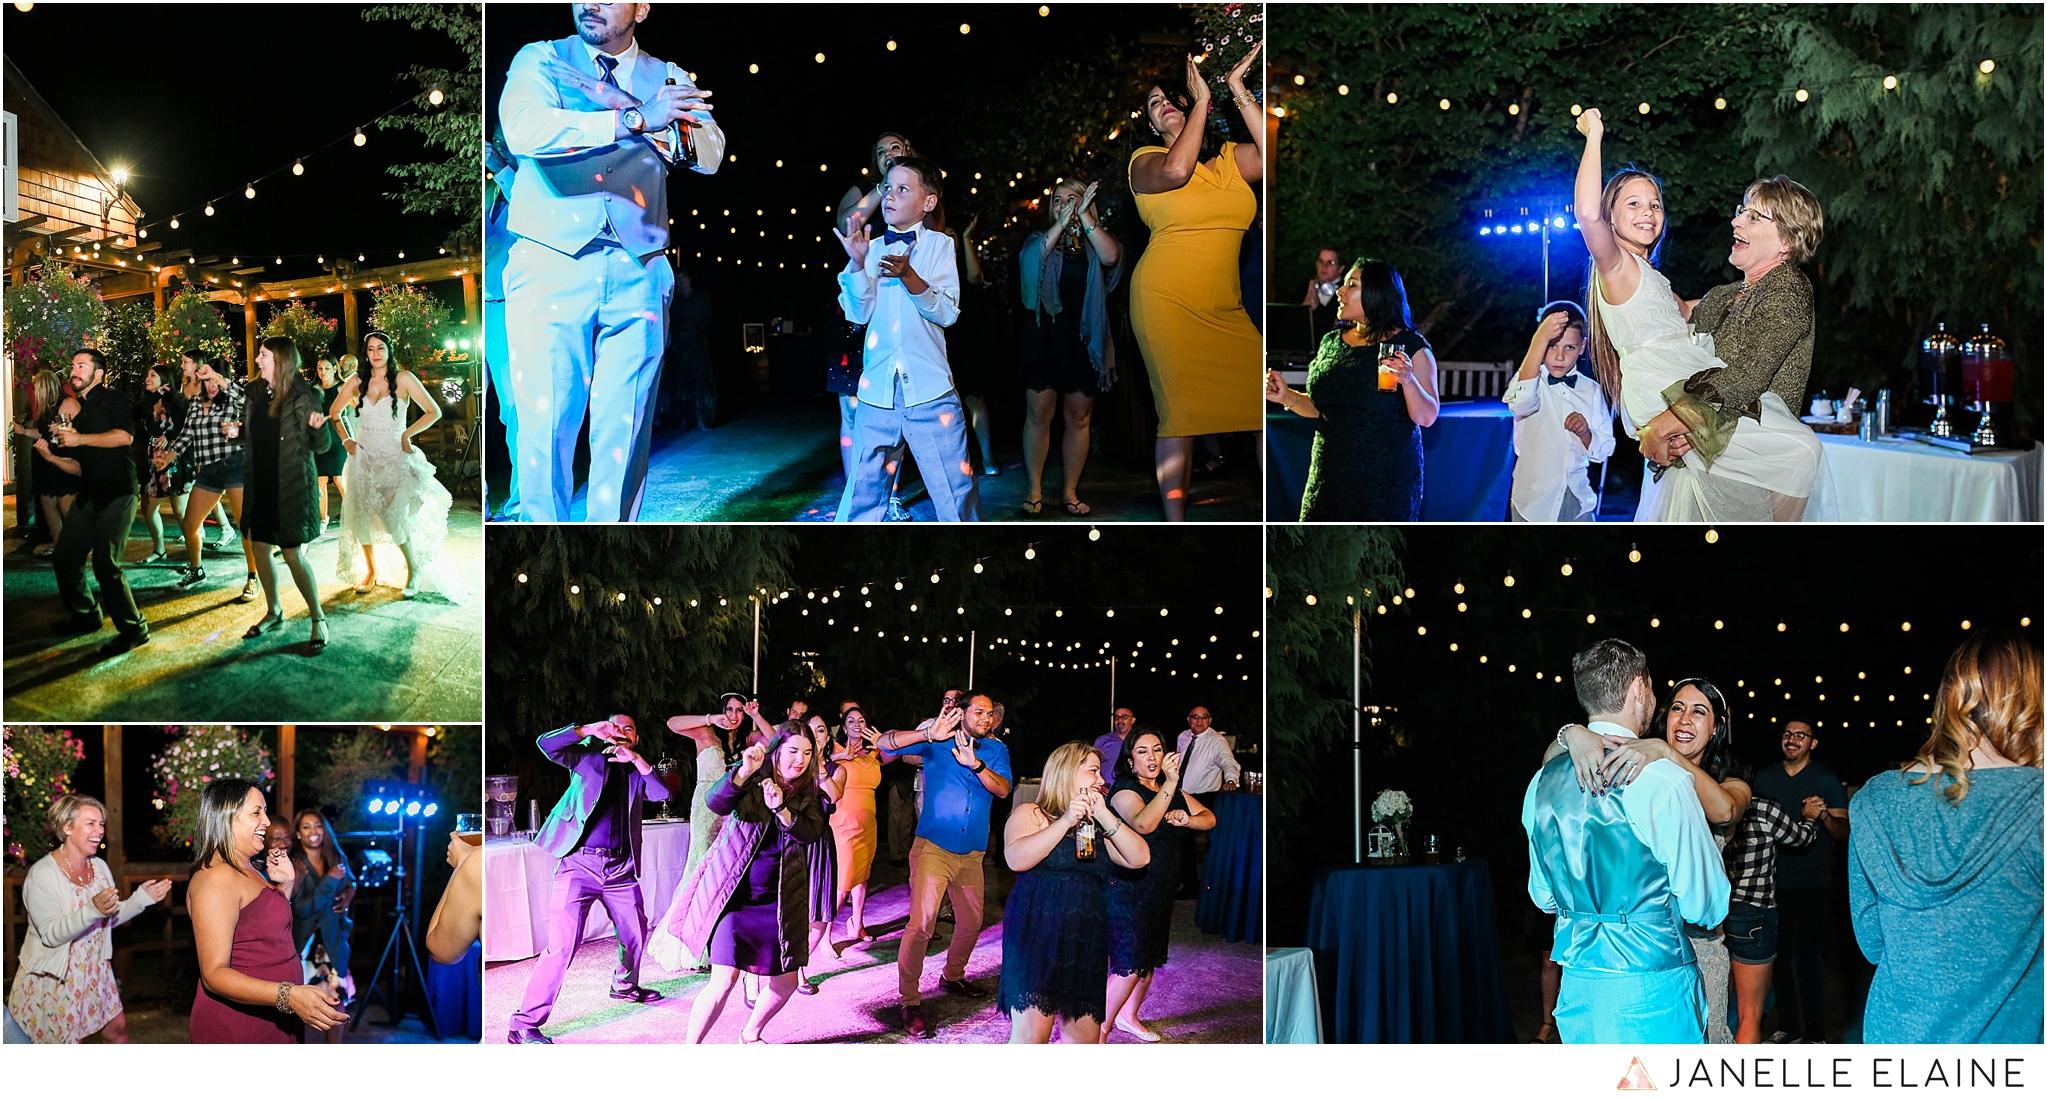 janelle elaine photography-professional wedding photographer-seattle-bellevue-robinswood house-306.jpg